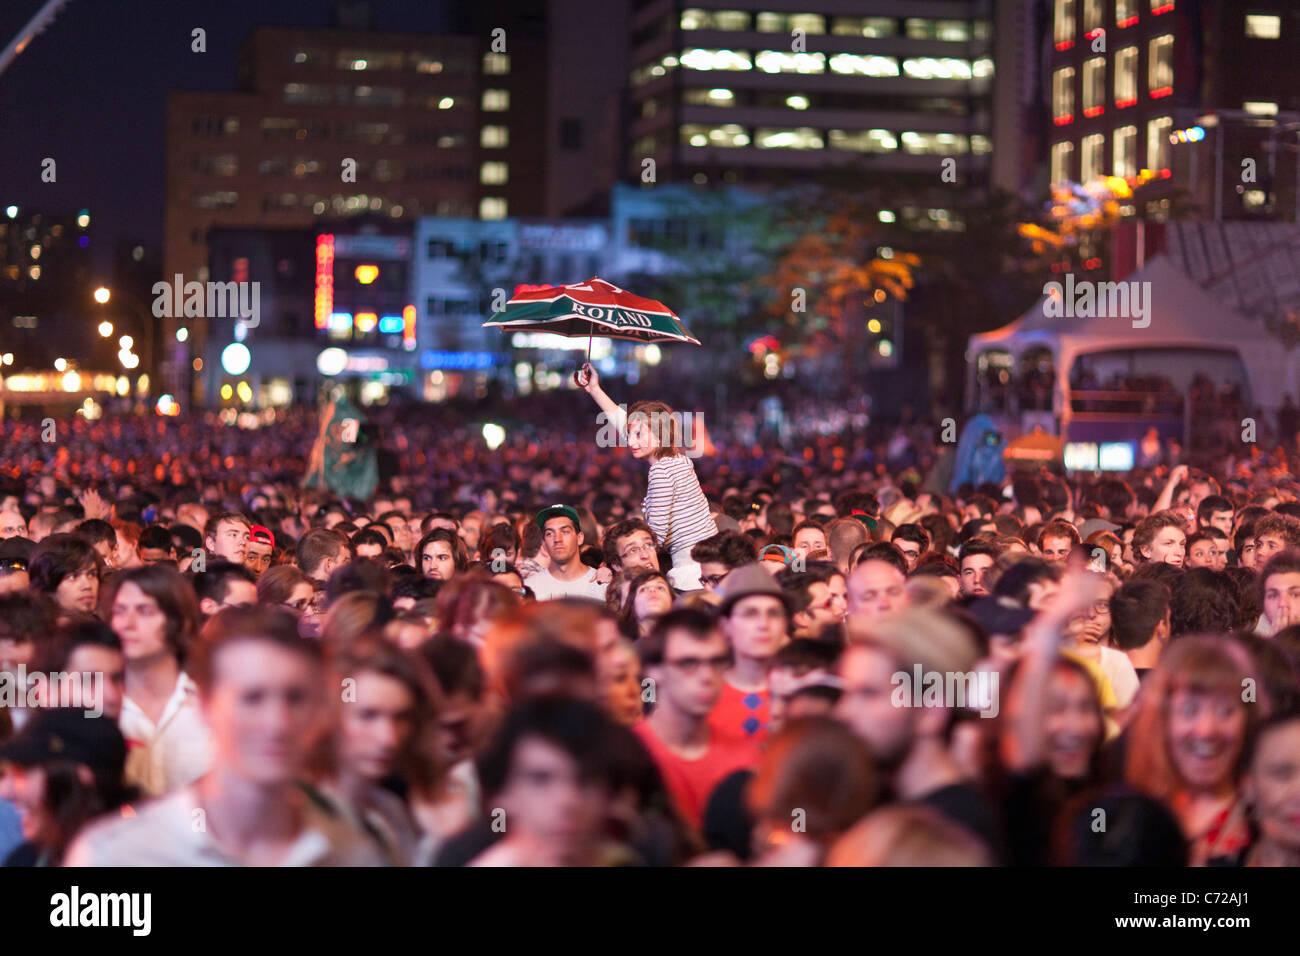 Kanada, Quebec, Montreal, Montreal Jazzfestival, Menschenmenge Stockbild